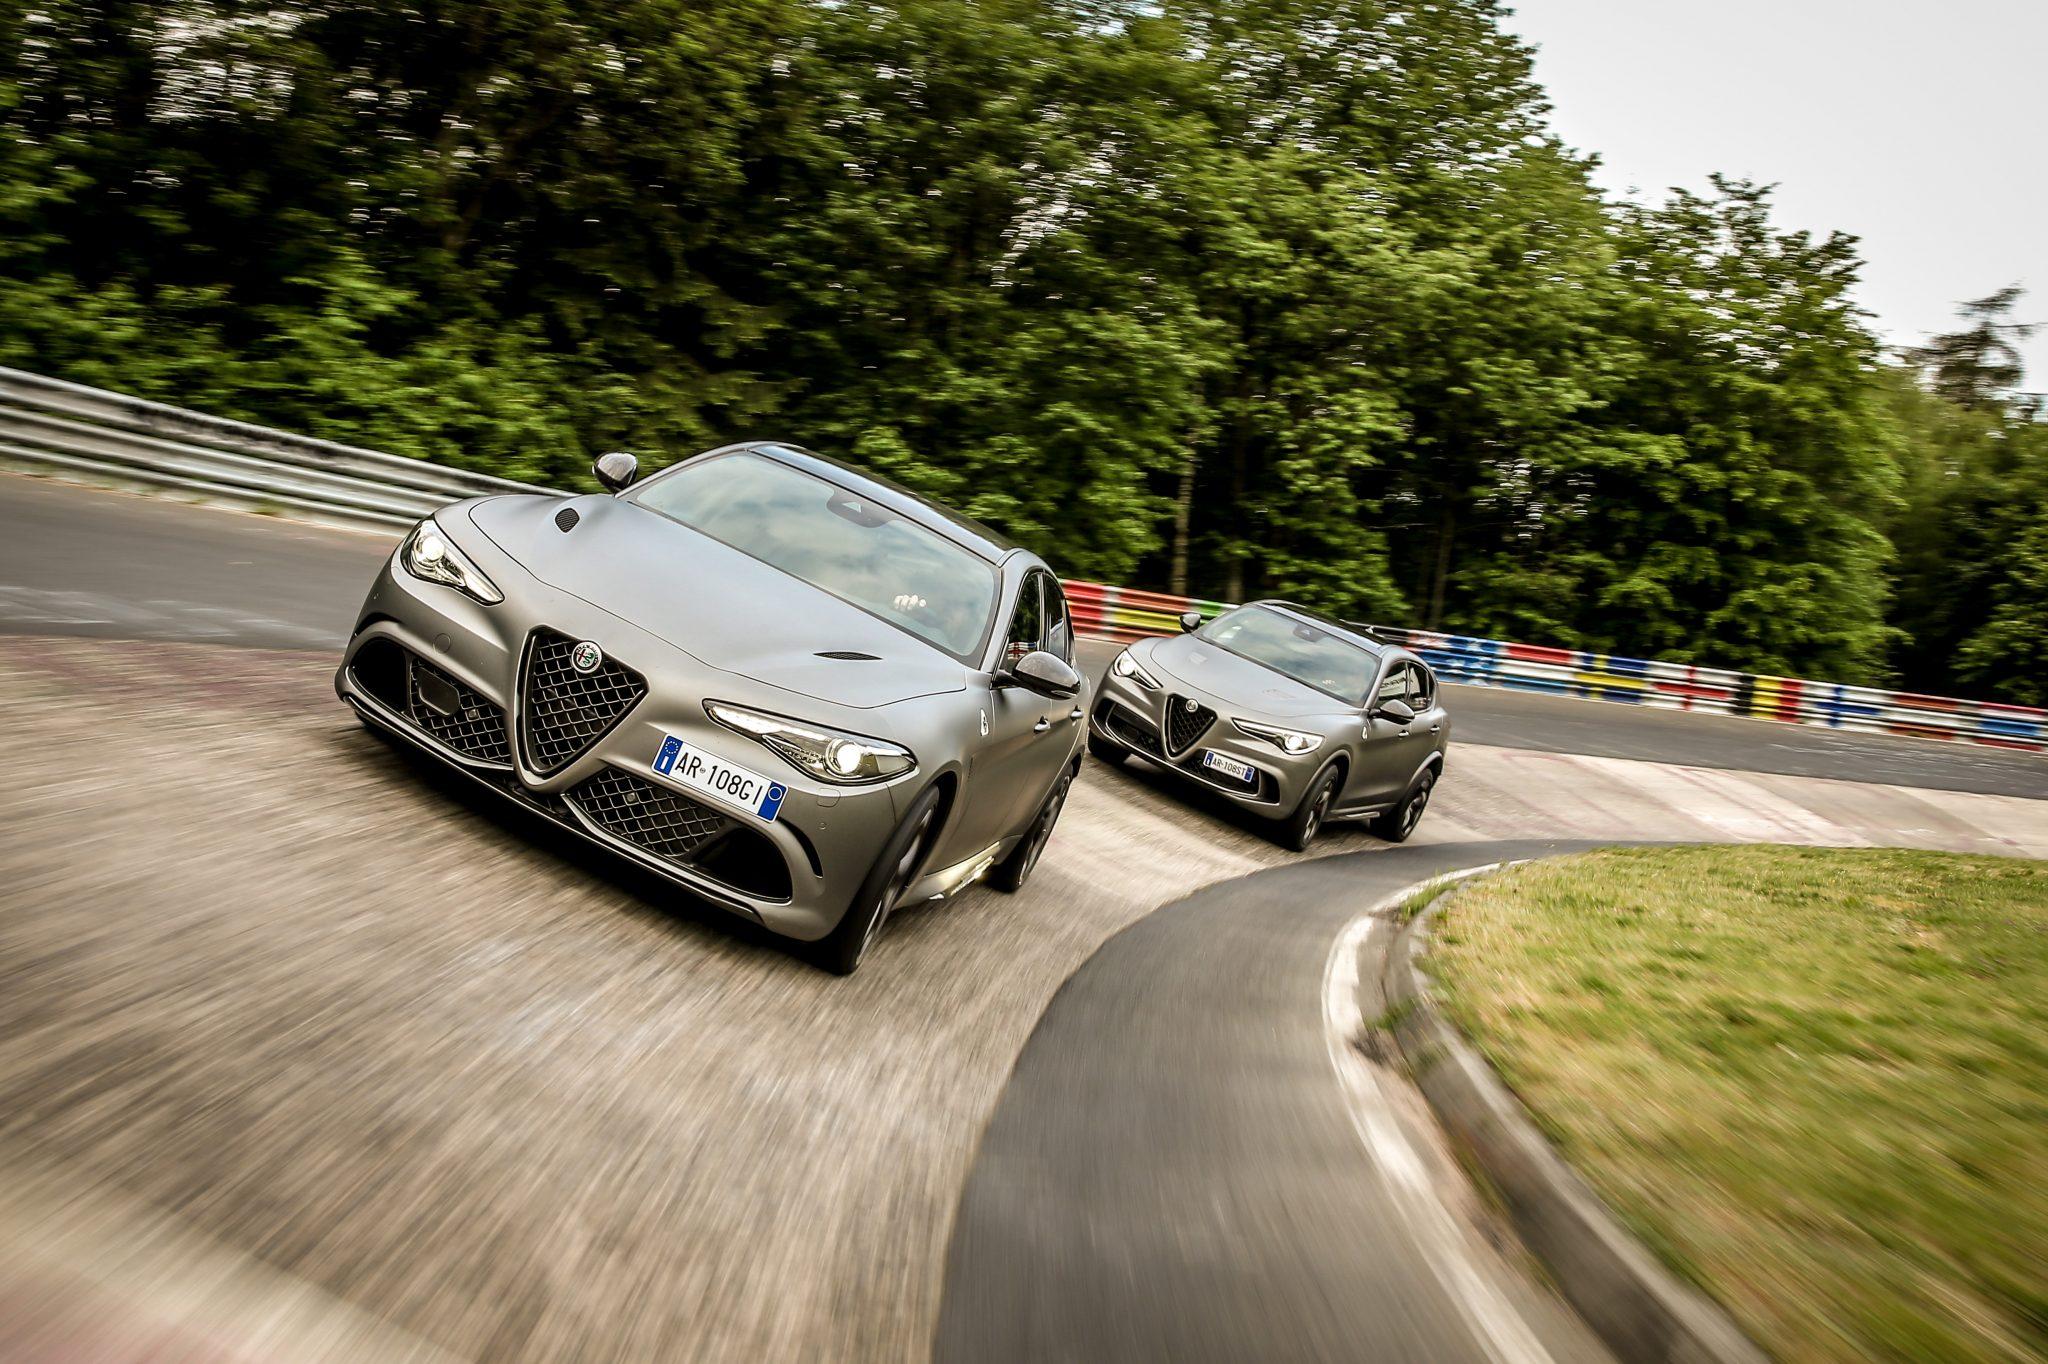 Alfa Romeo kentekenplaten